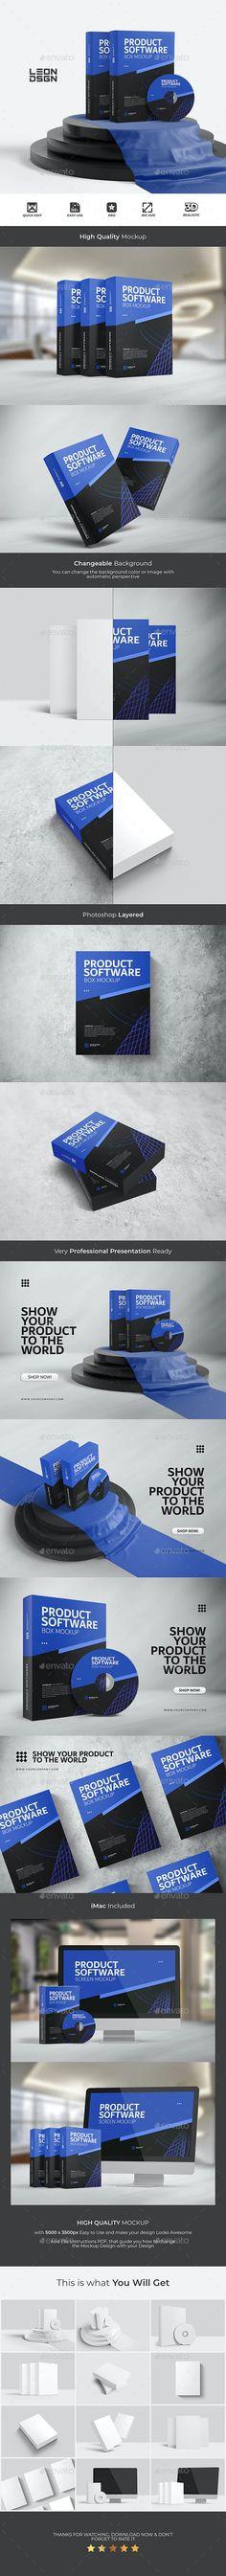 Software Product - Box Mockup by leon_dsgn | GraphicRiver